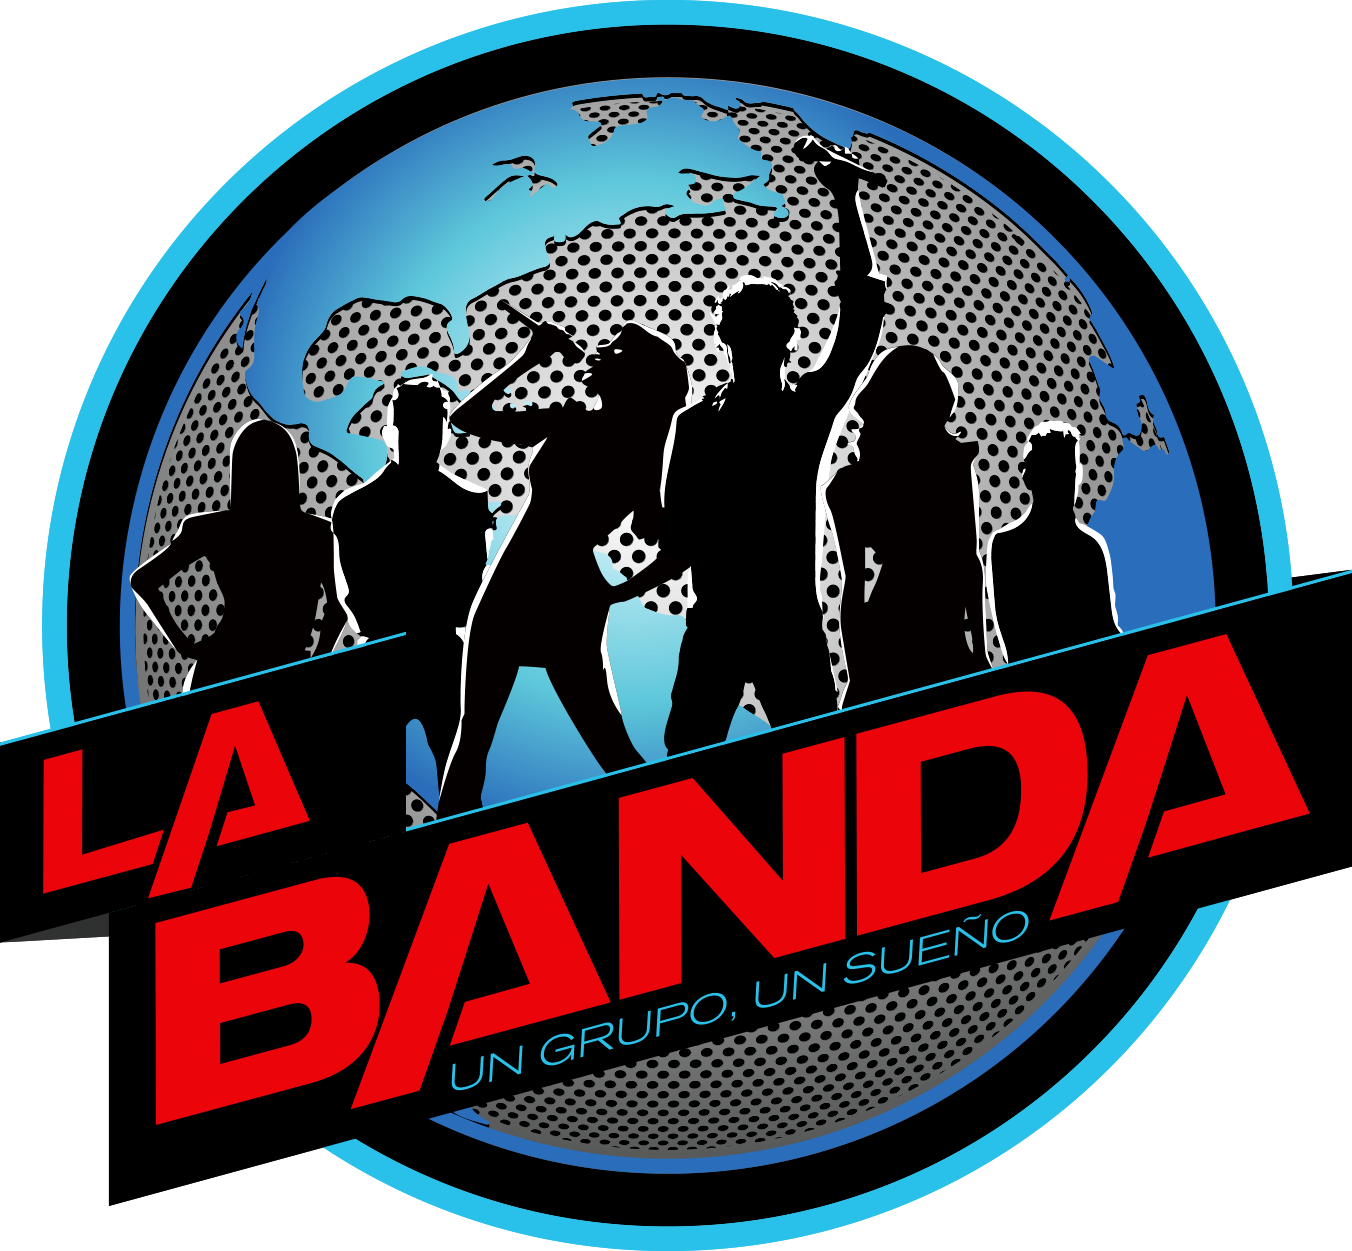 LA BANDA LOGO SOCIAL FOLLOW